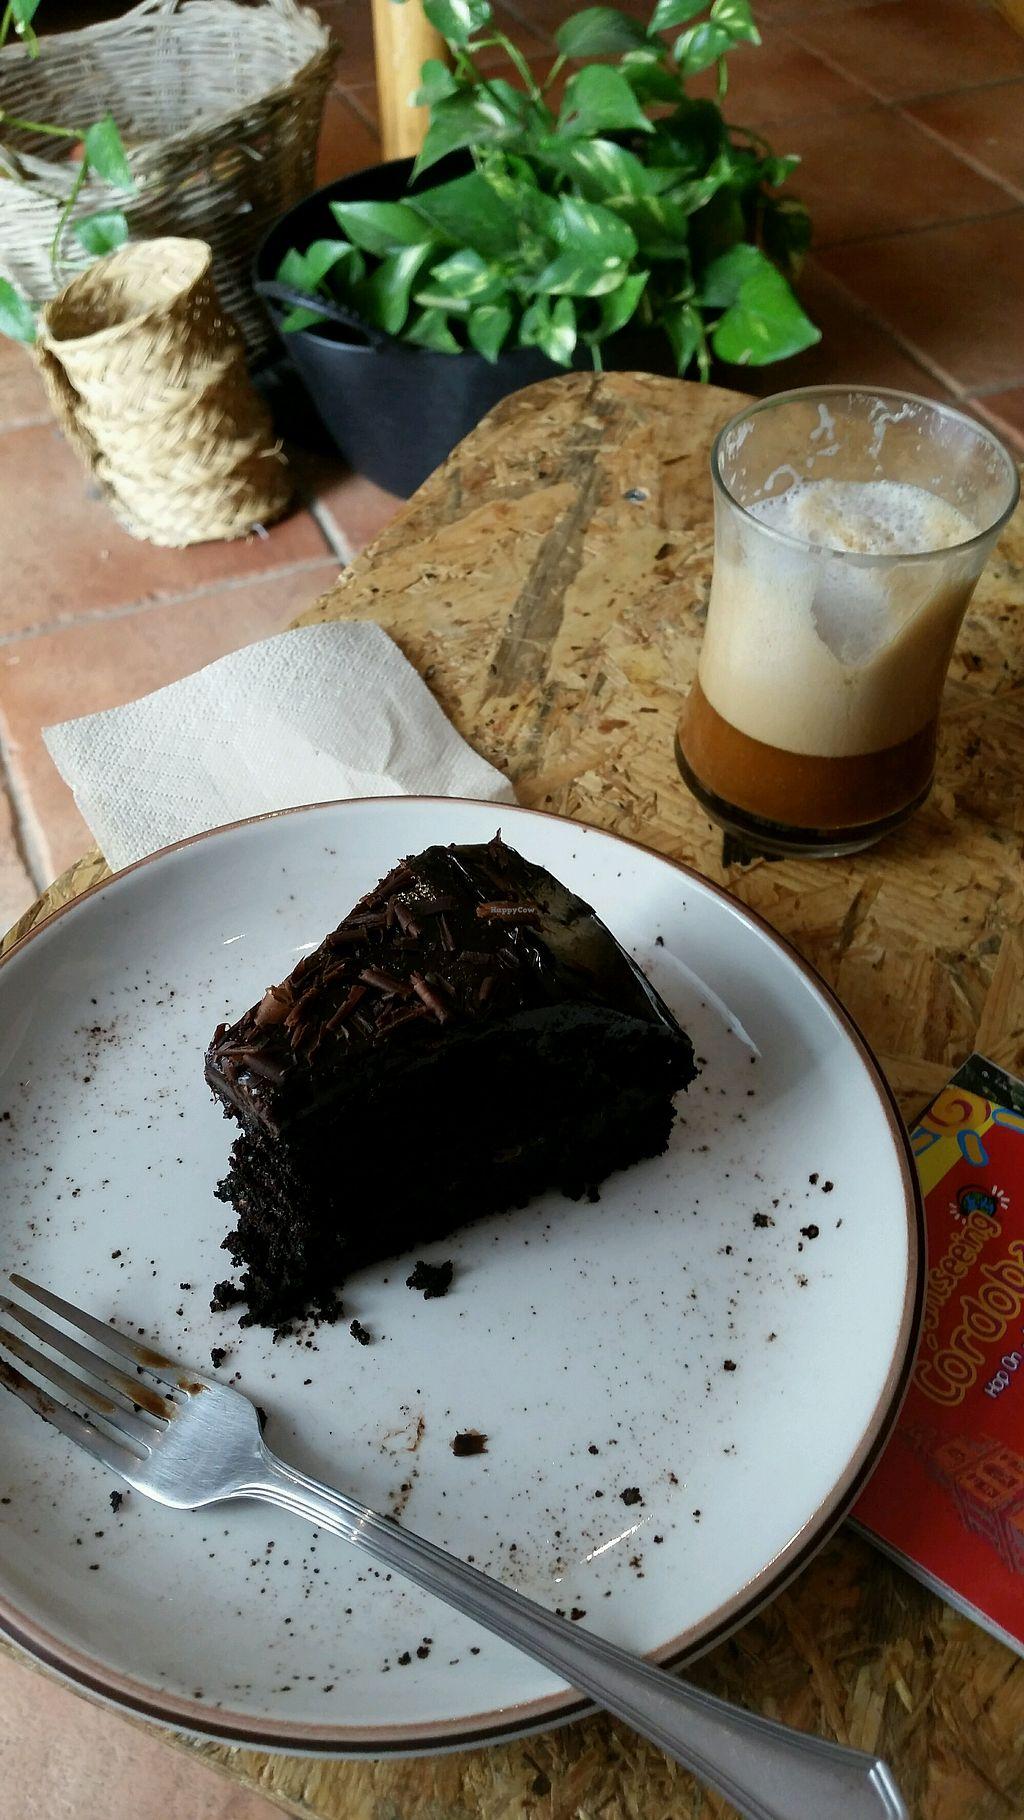 "Photo of La Libelula Coffeeshop  by <a href=""/members/profile/ColetteOrton"">ColetteOrton</a> <br/>Yummy chocolate cake!  <br/> April 19, 2018  - <a href='/contact/abuse/image/87896/388115'>Report</a>"